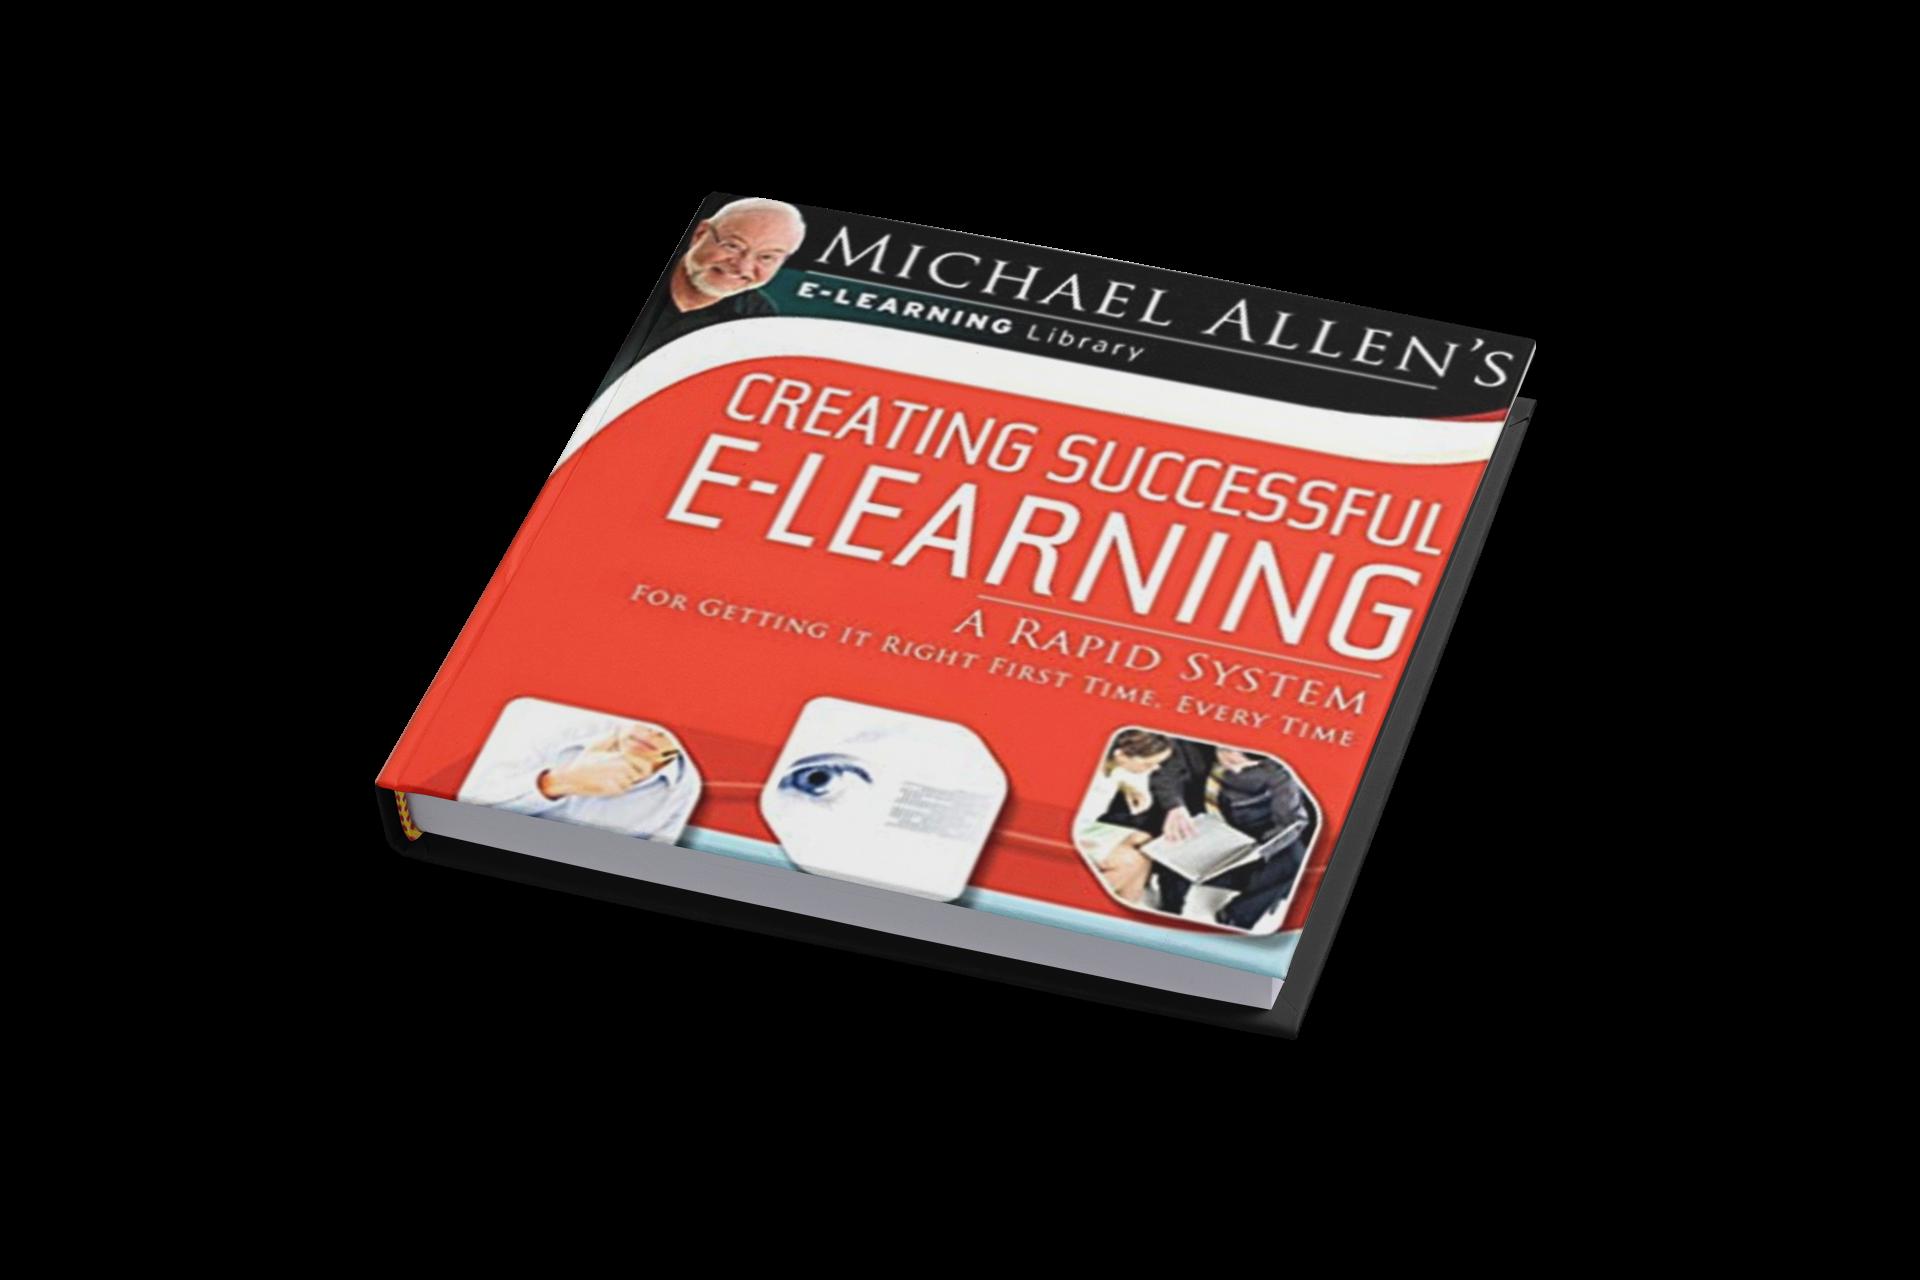 Creating Successful e-Learning